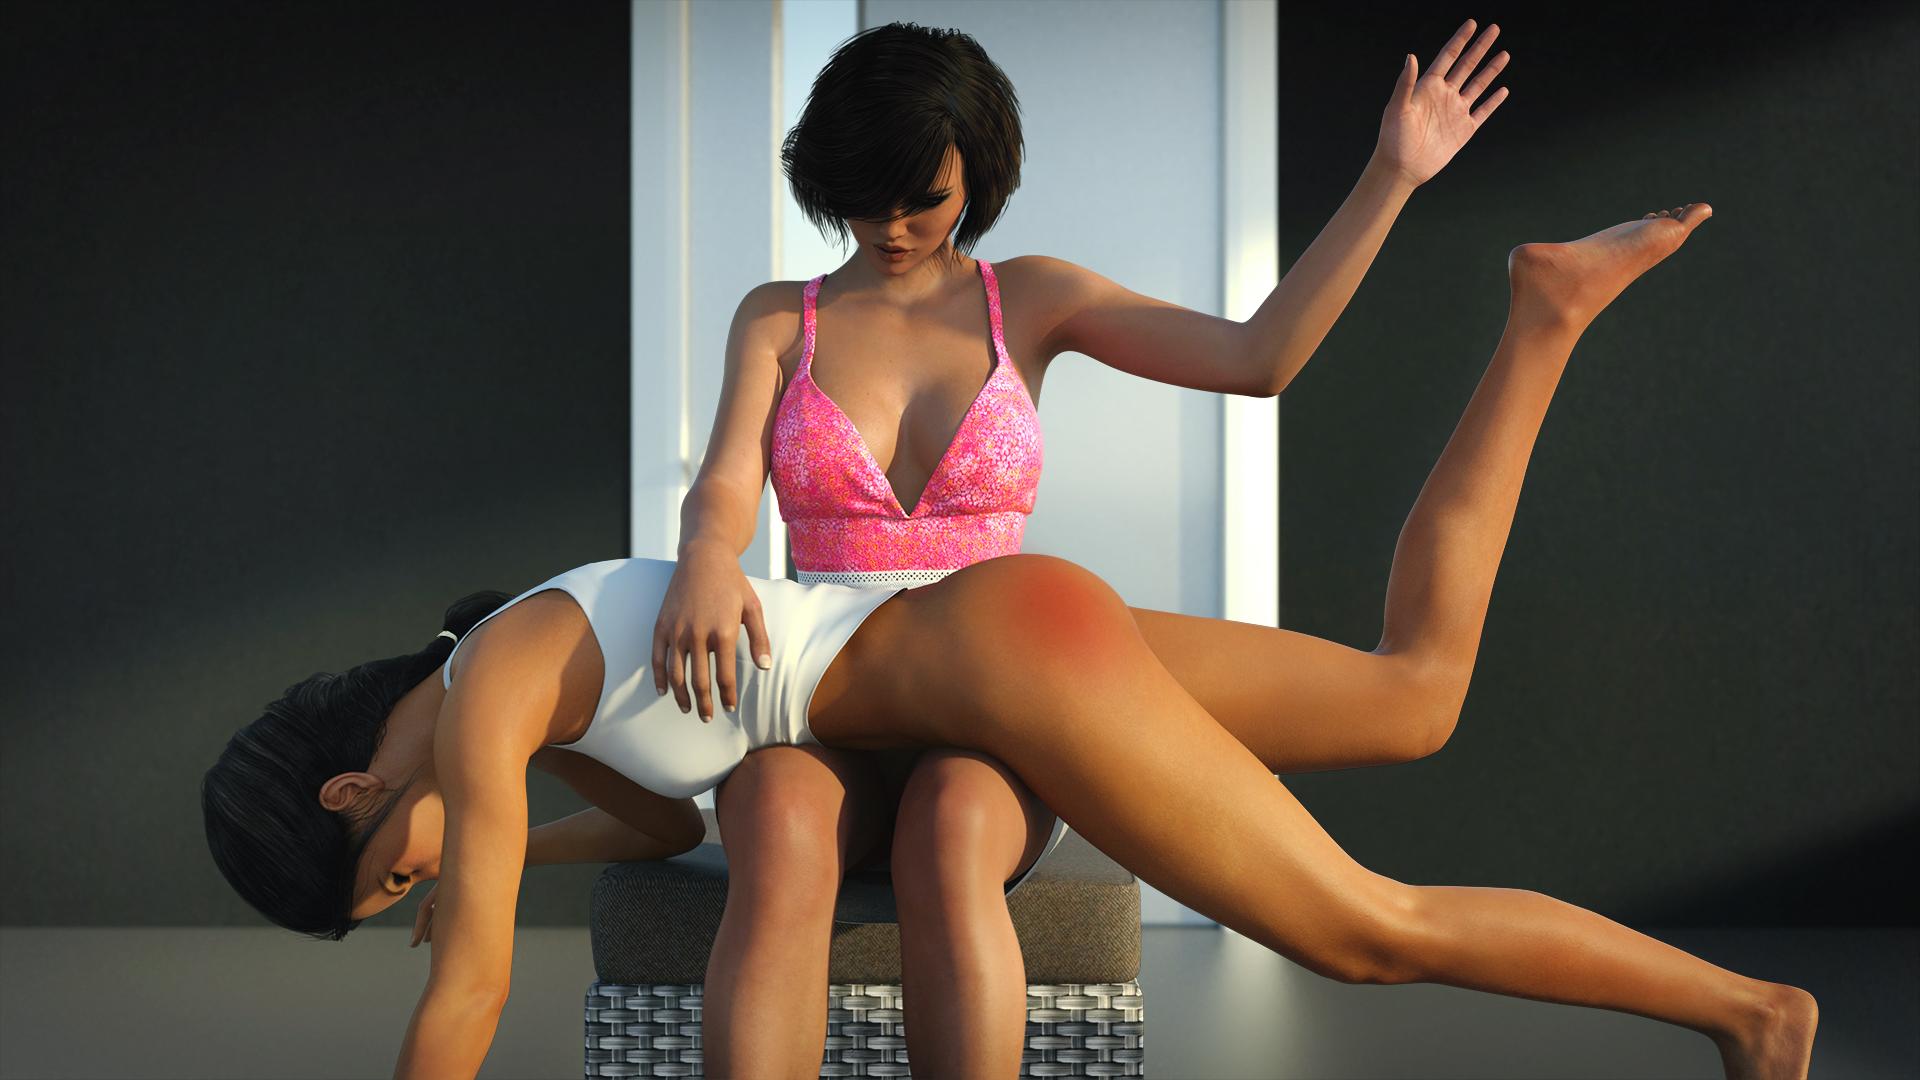 Threesome sex tgp